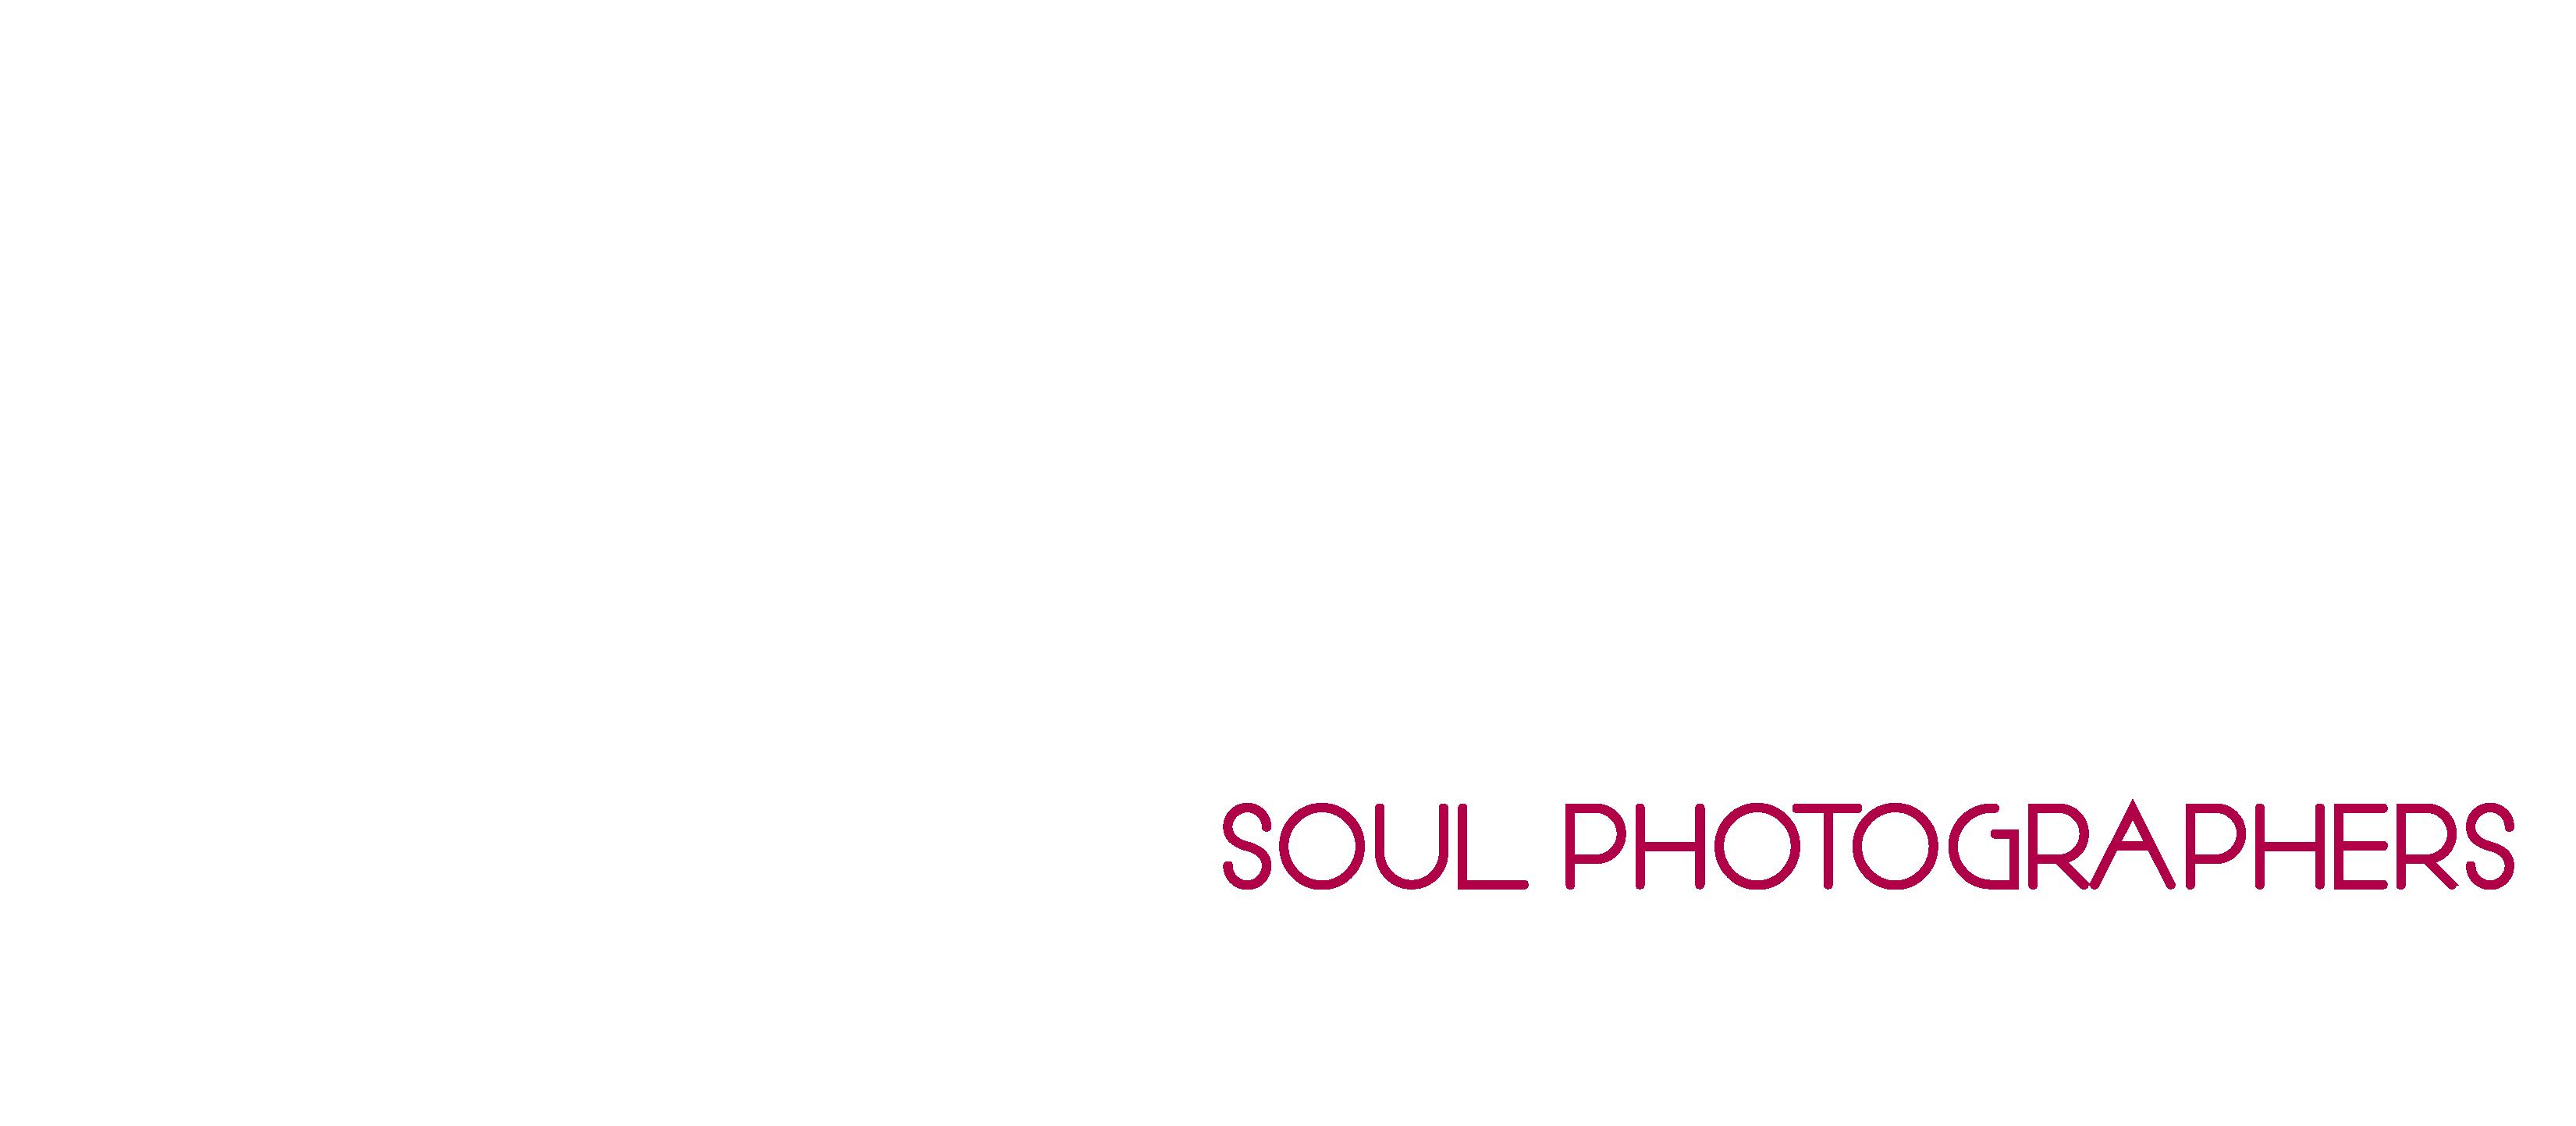 Elalfie Group – Fotografo Eboli Fotografo Palma Campania Fotografo Nola Fotografo Napoli Fotografo Salerno